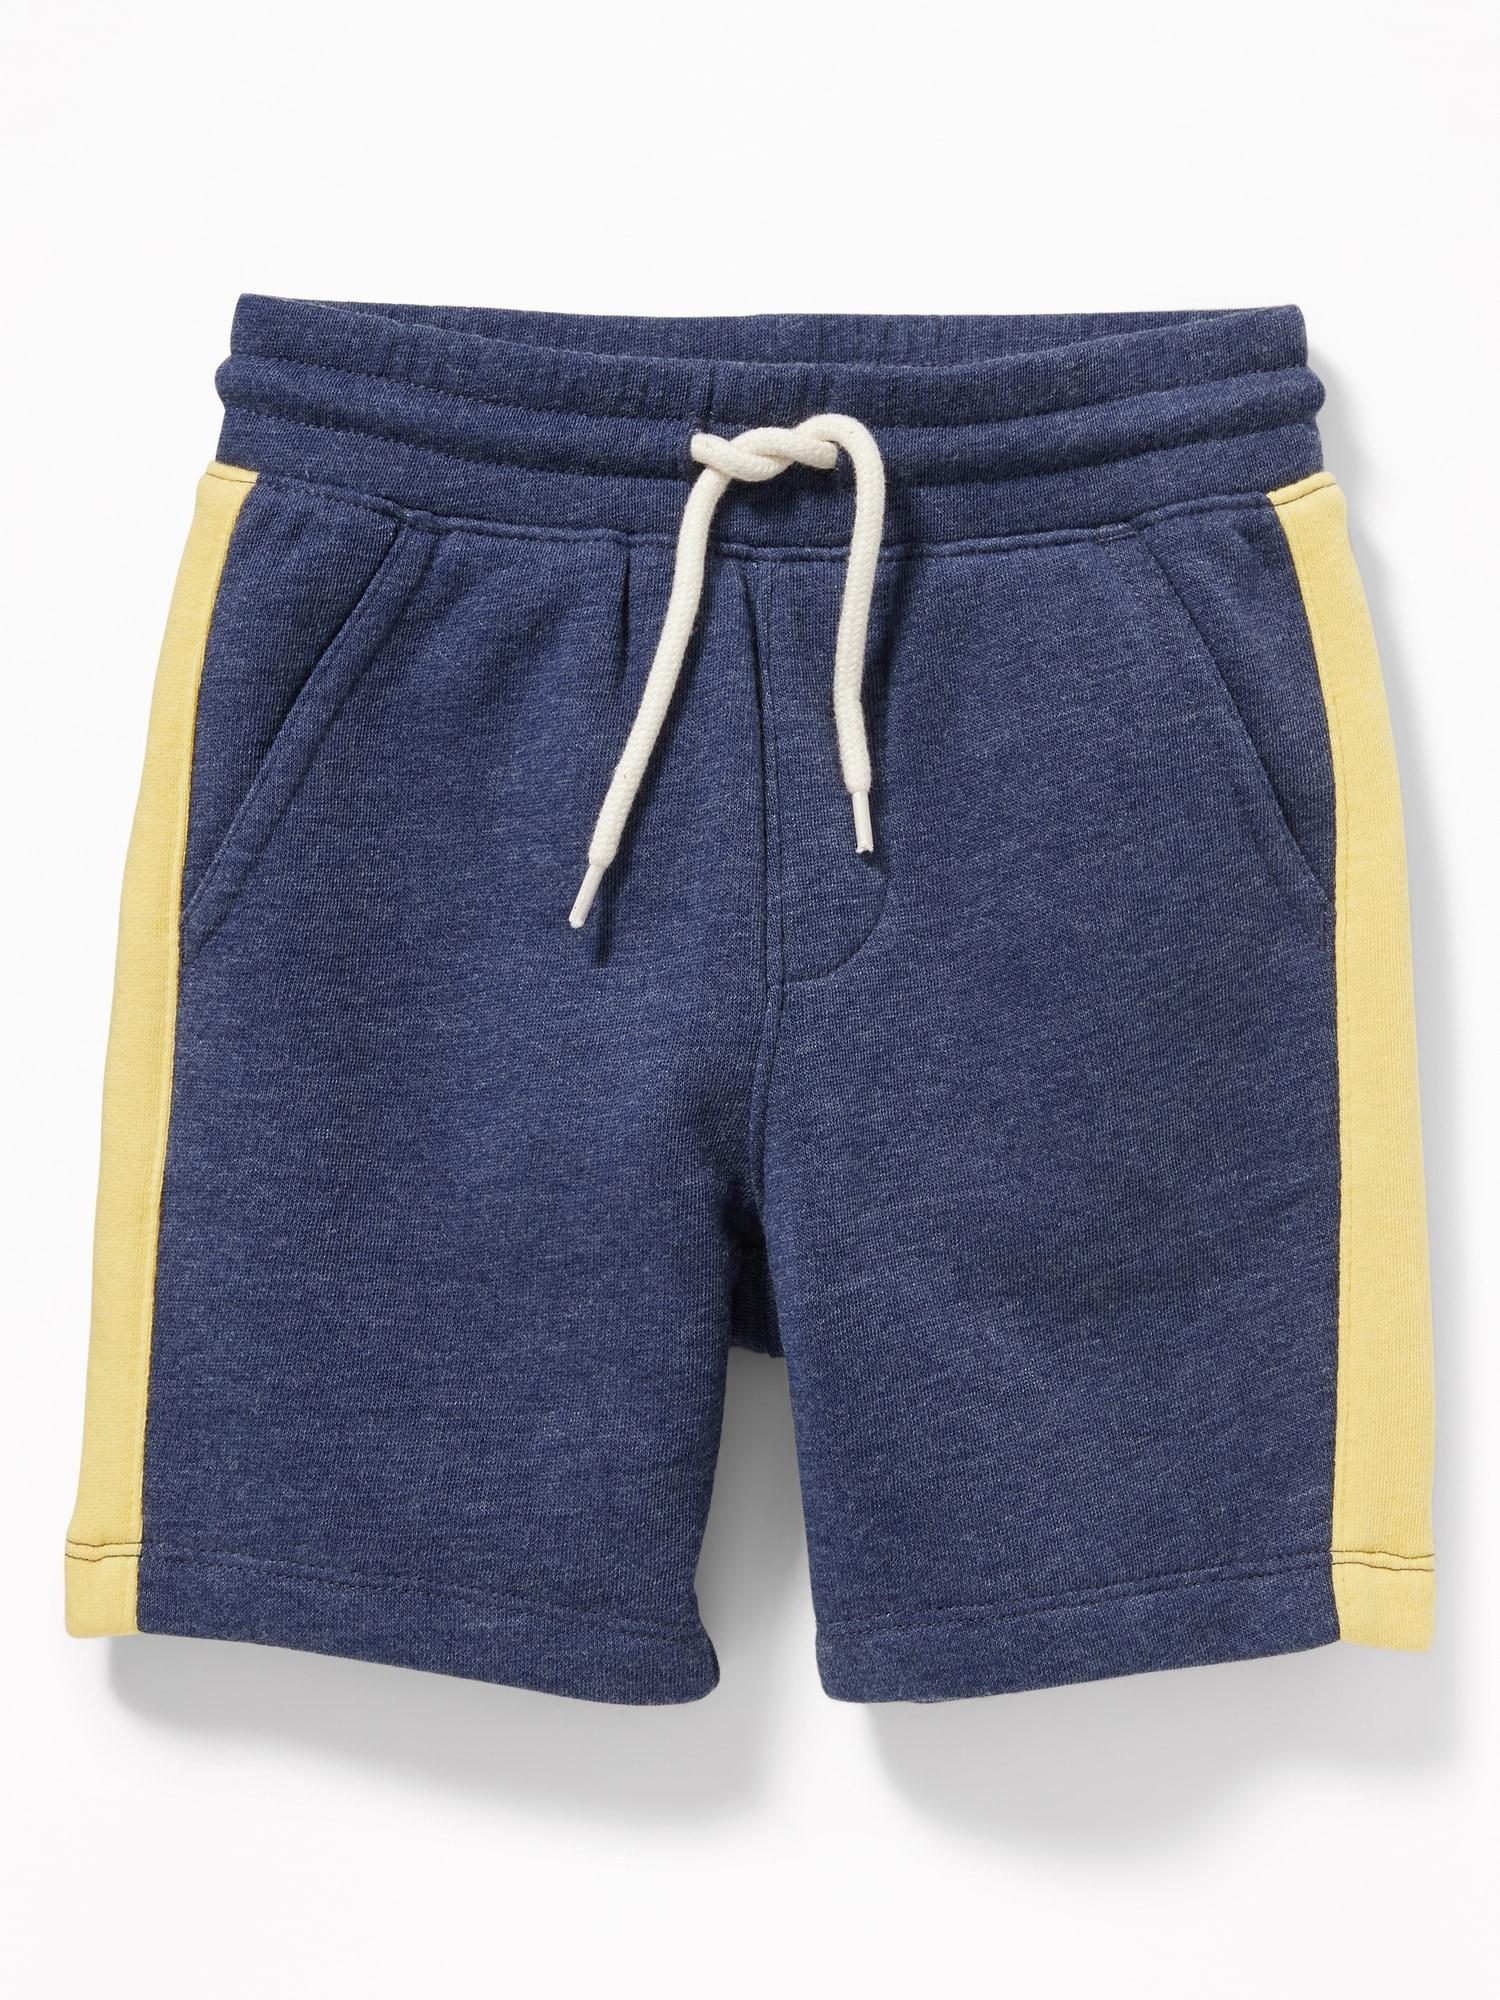 6fef25742cc Functional Drawstring Side-Stripe Jogger Shorts for Toddler Boys ...